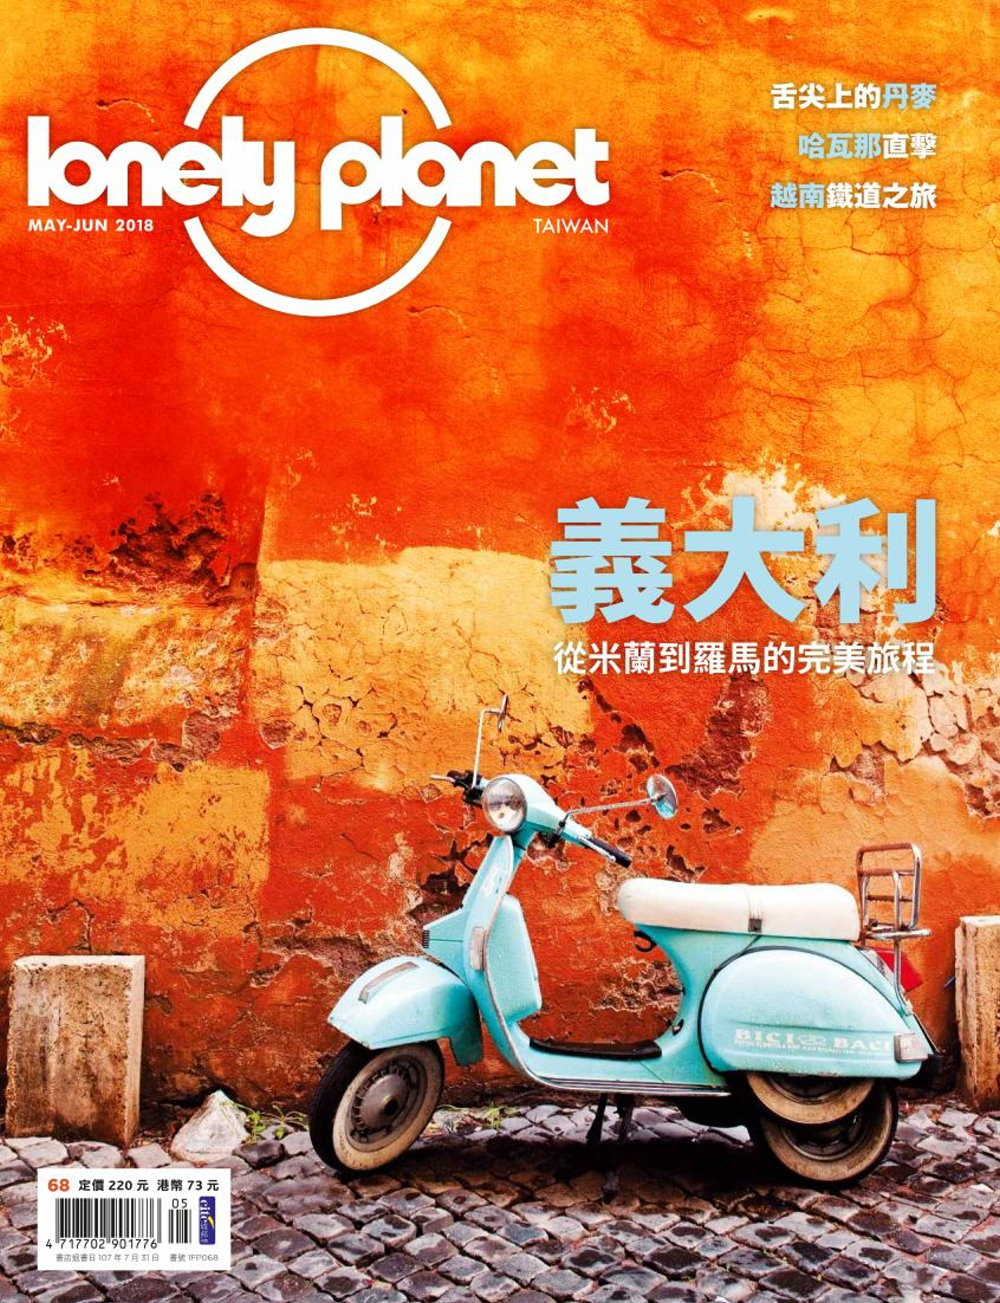 孤獨星球Lonely Planet 5月號/2018第68期